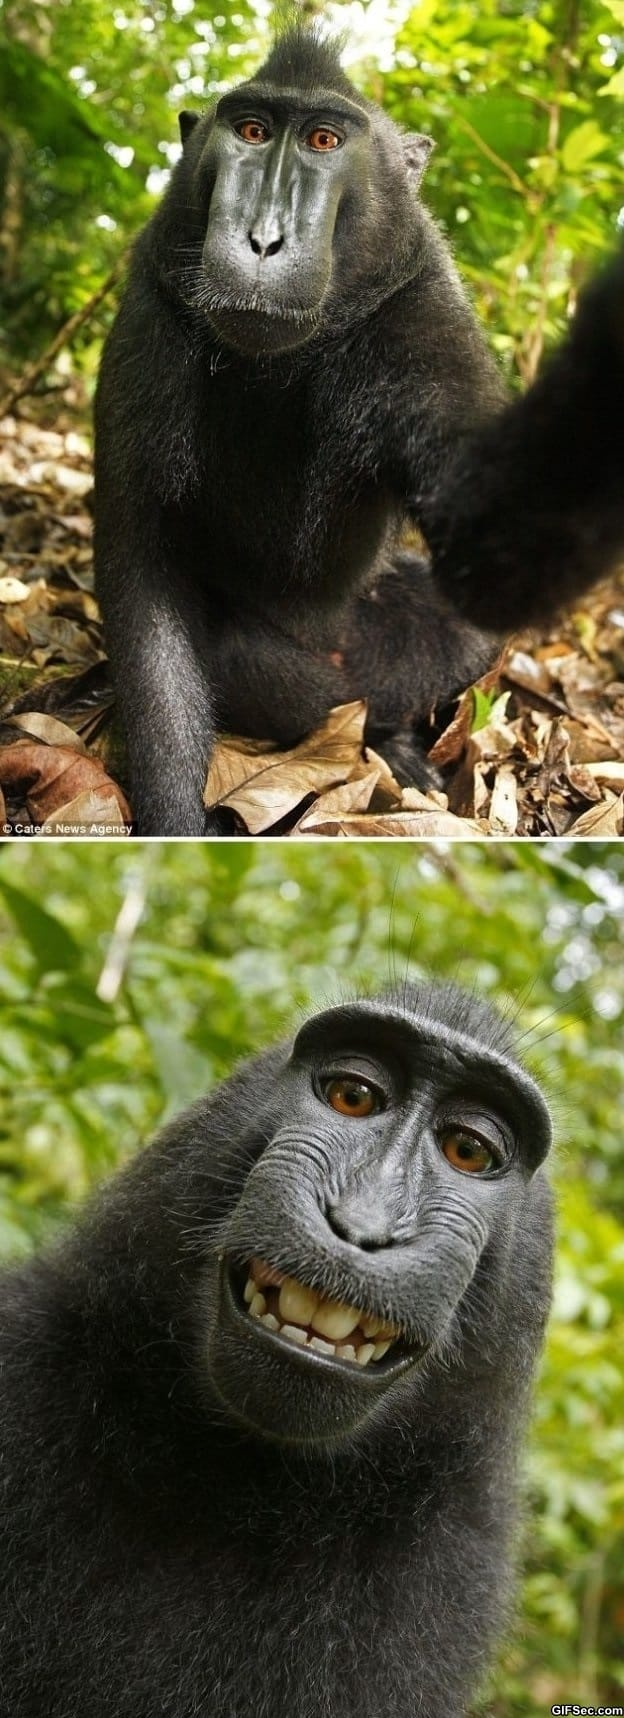 monkey-borrows-photographers-camera-to-take-self-portraits